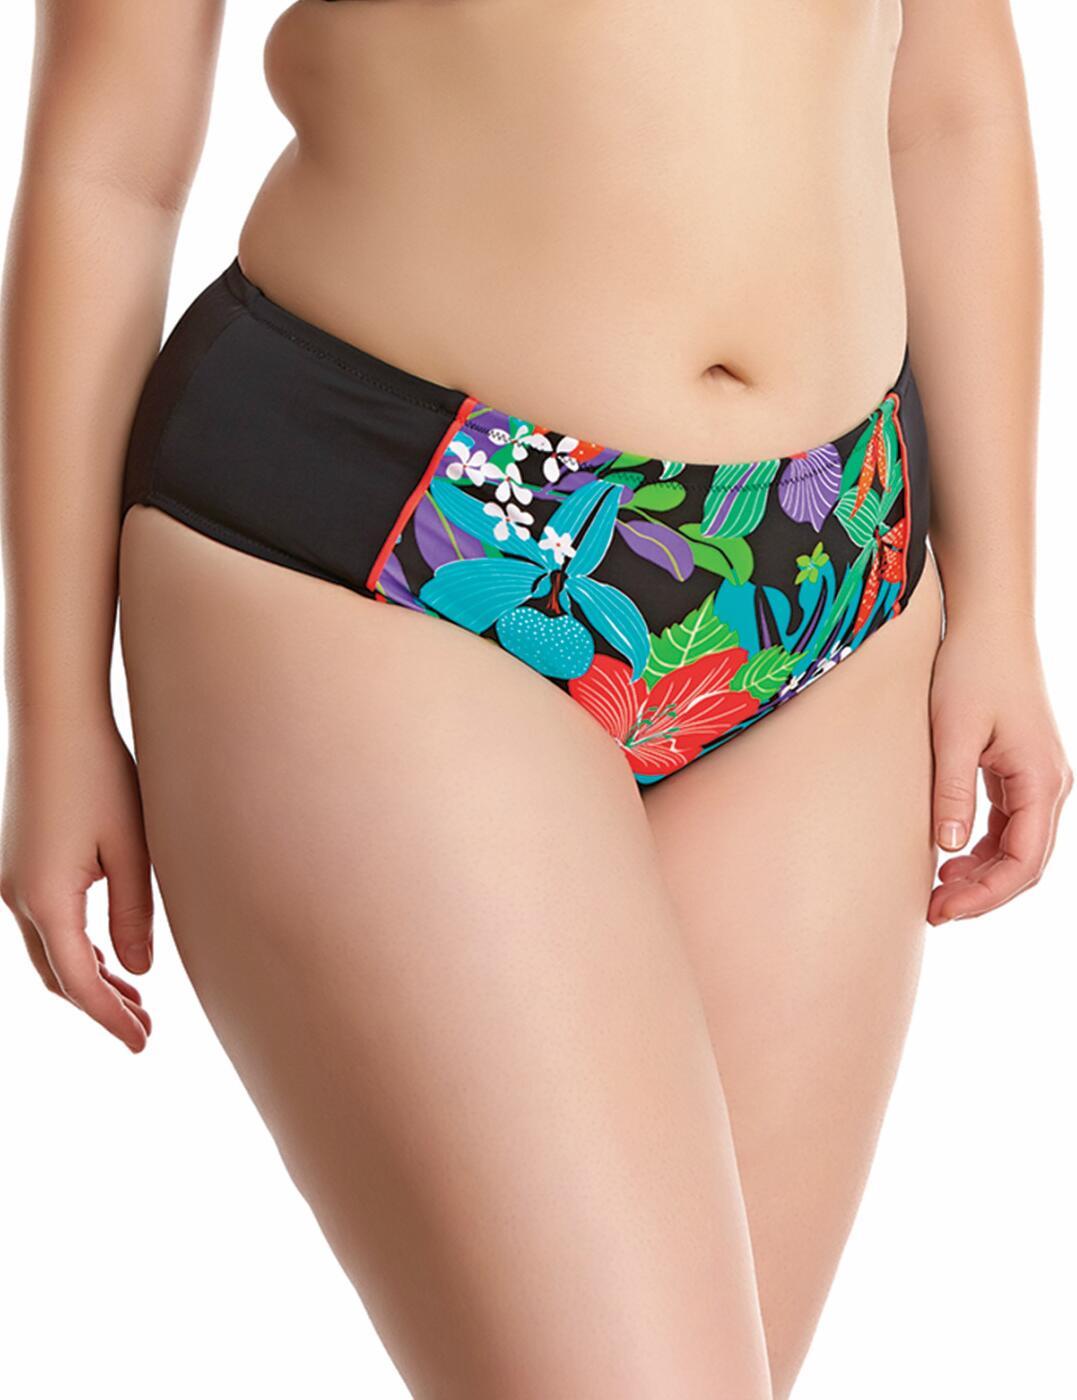 7094 Elomi Cubana Mid Rise Bikini Brief Black - 7094 Bikini Brief